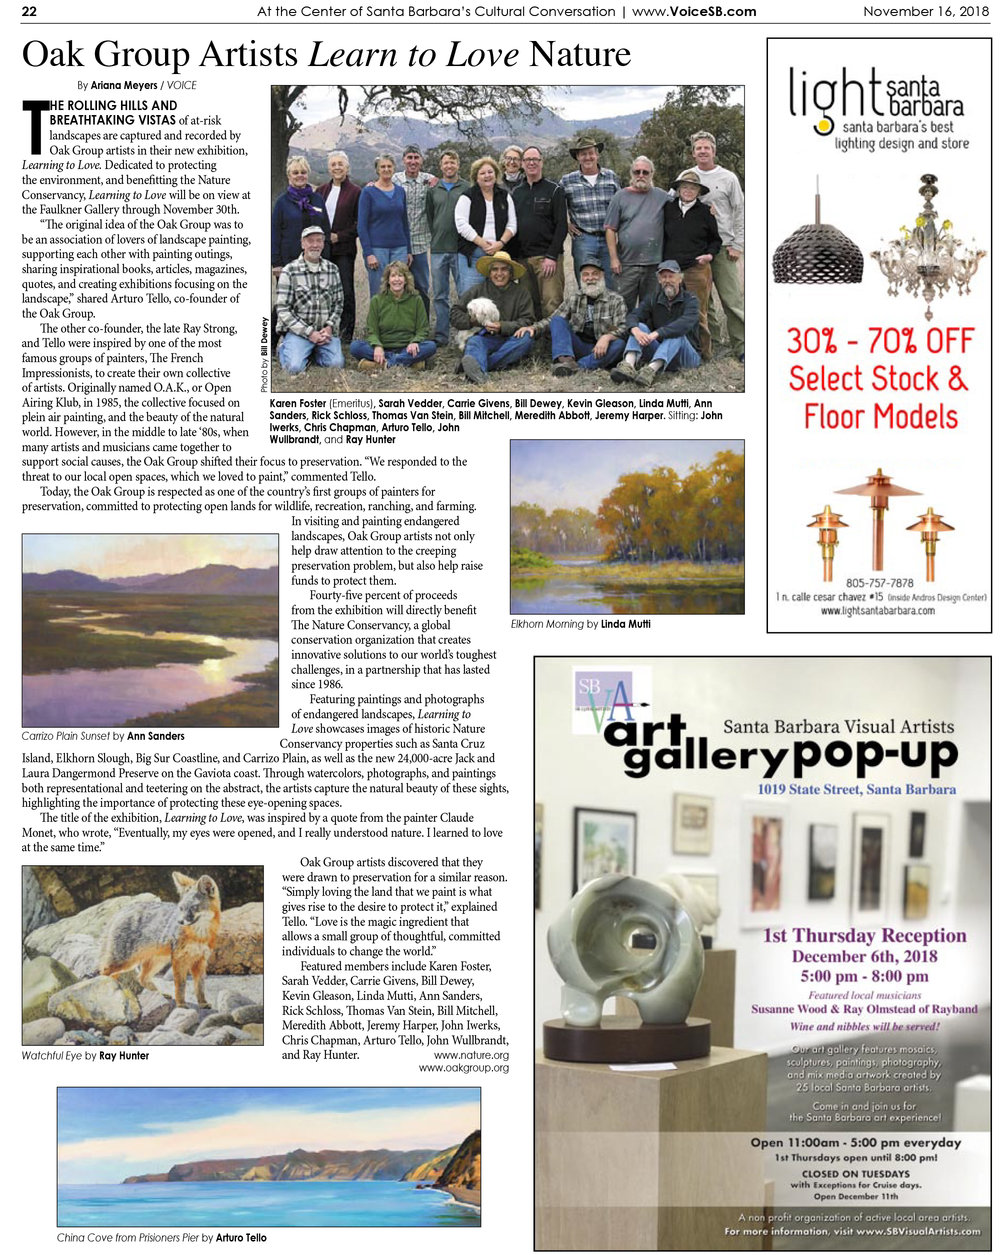 Oak Group story 11.16.jpg